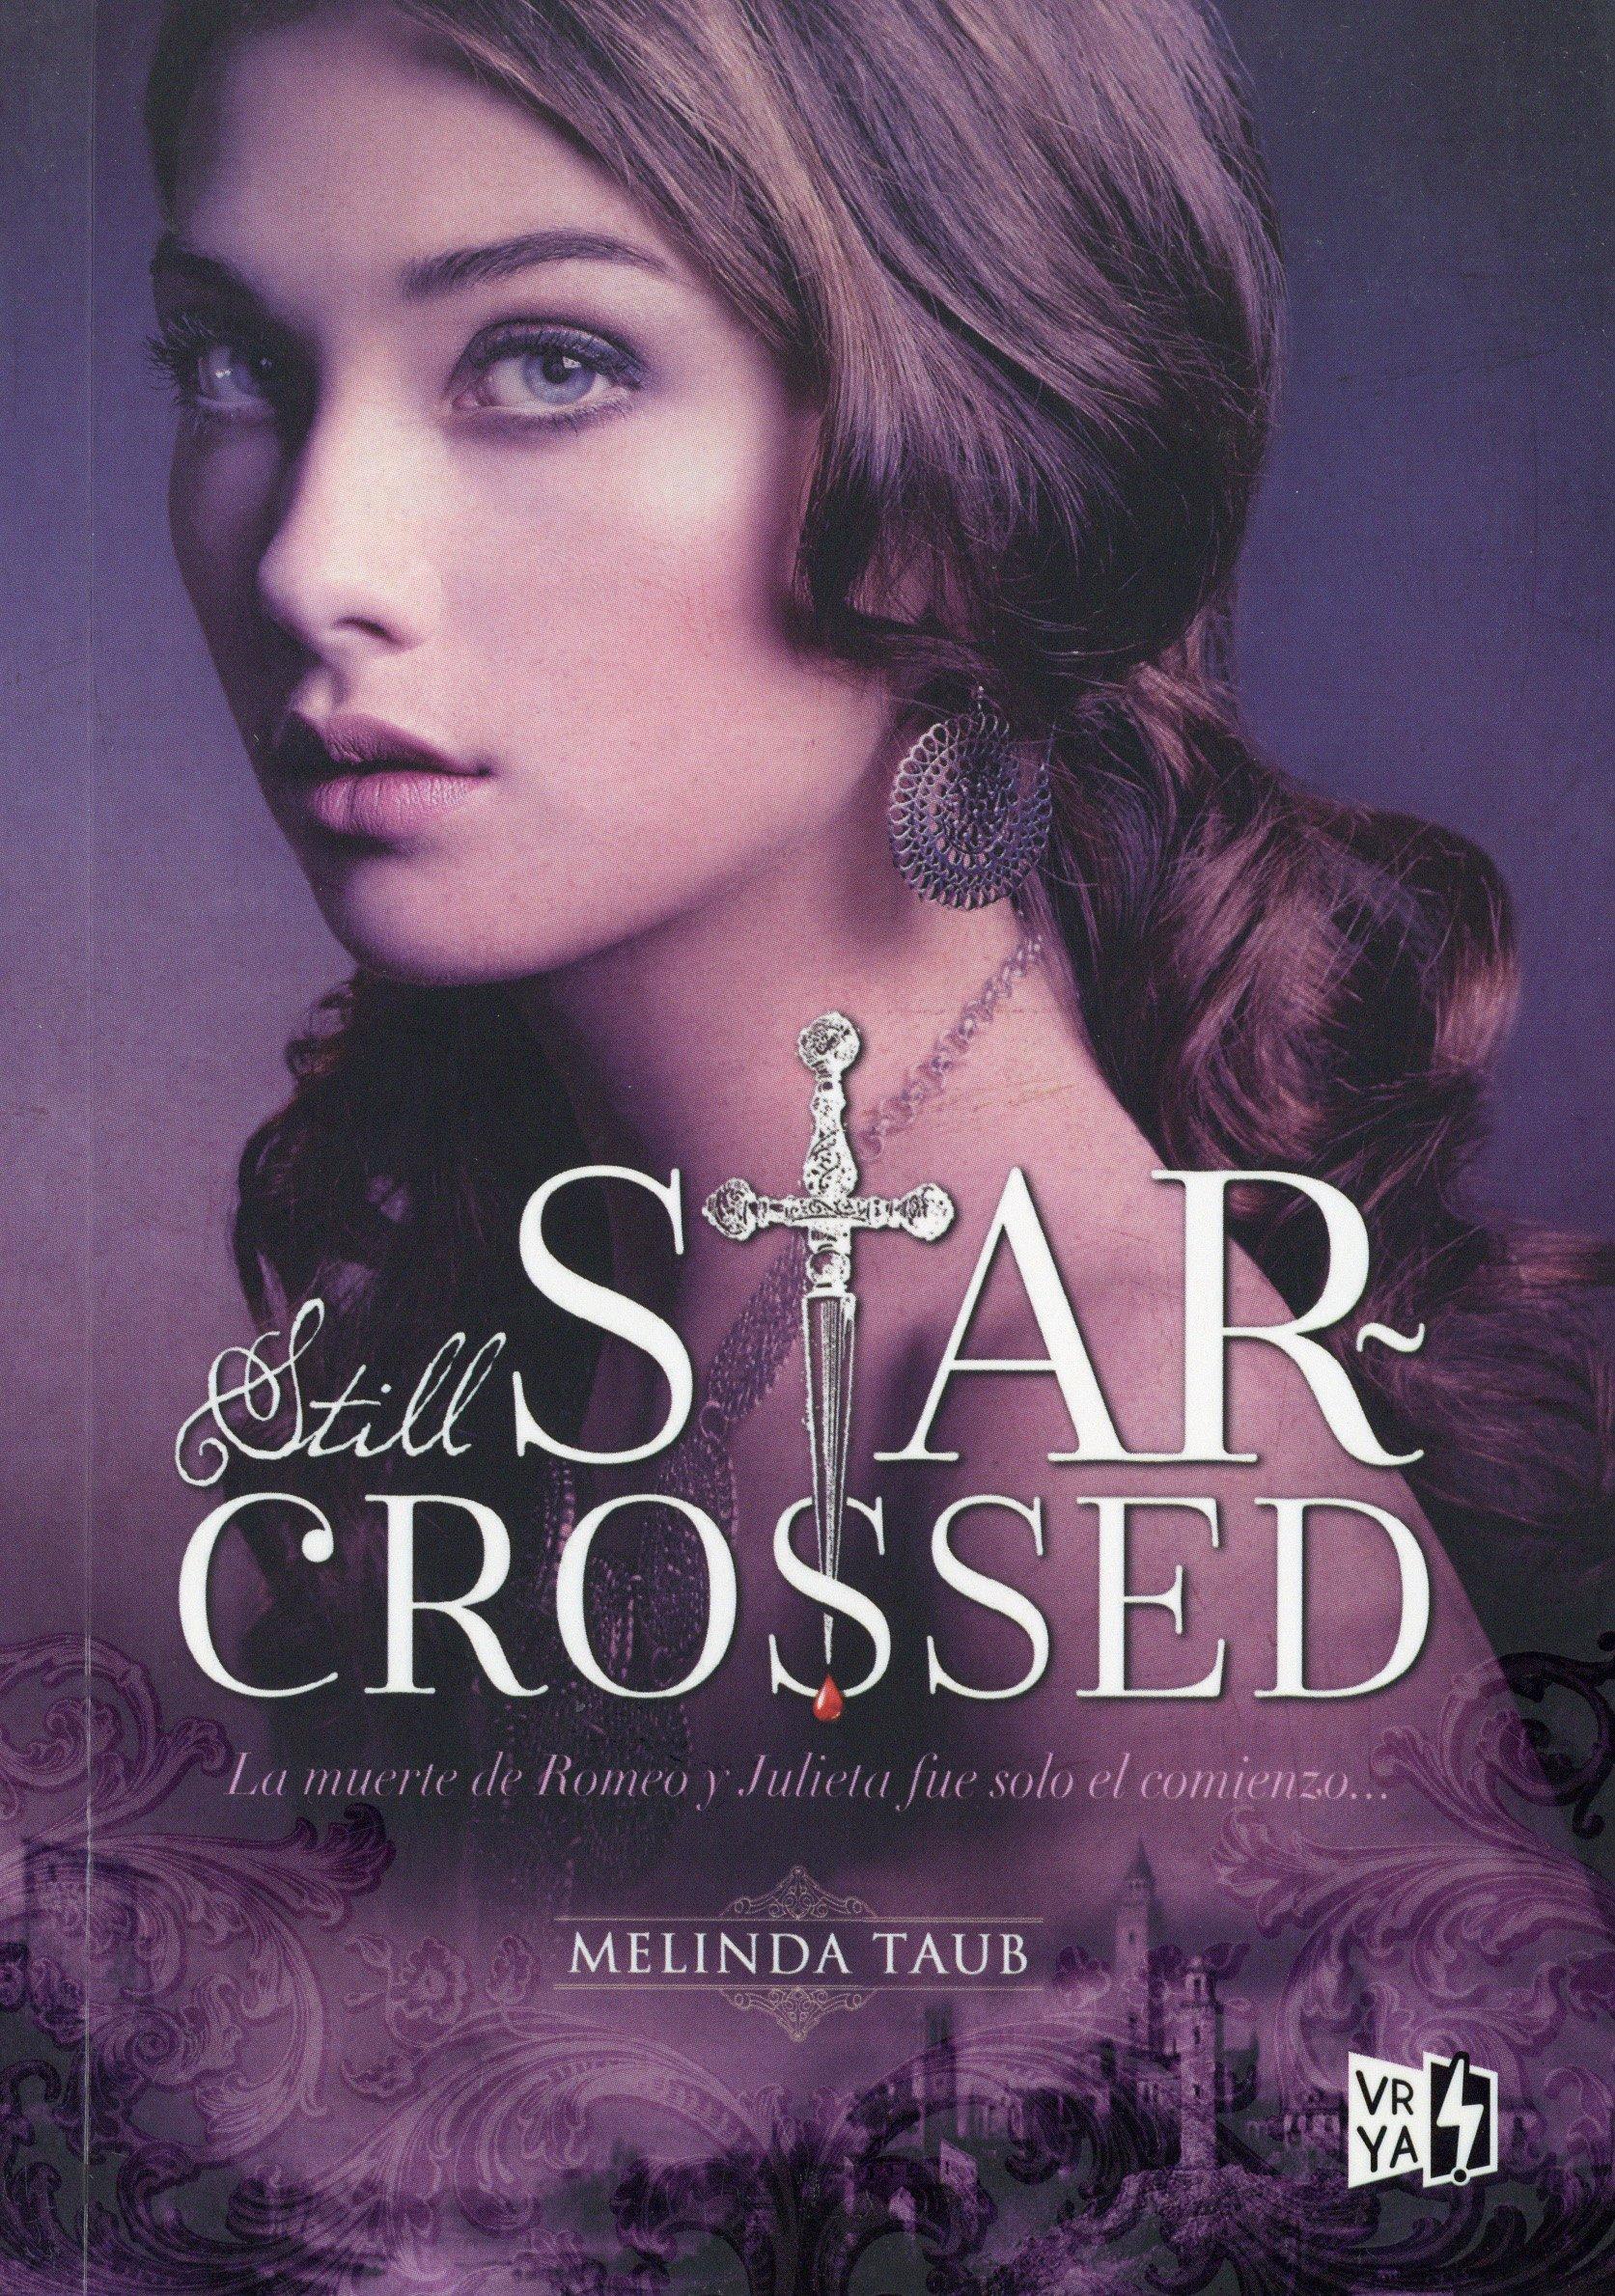 Still Star Crossed Spanish Edition Melinda Taub Vrya